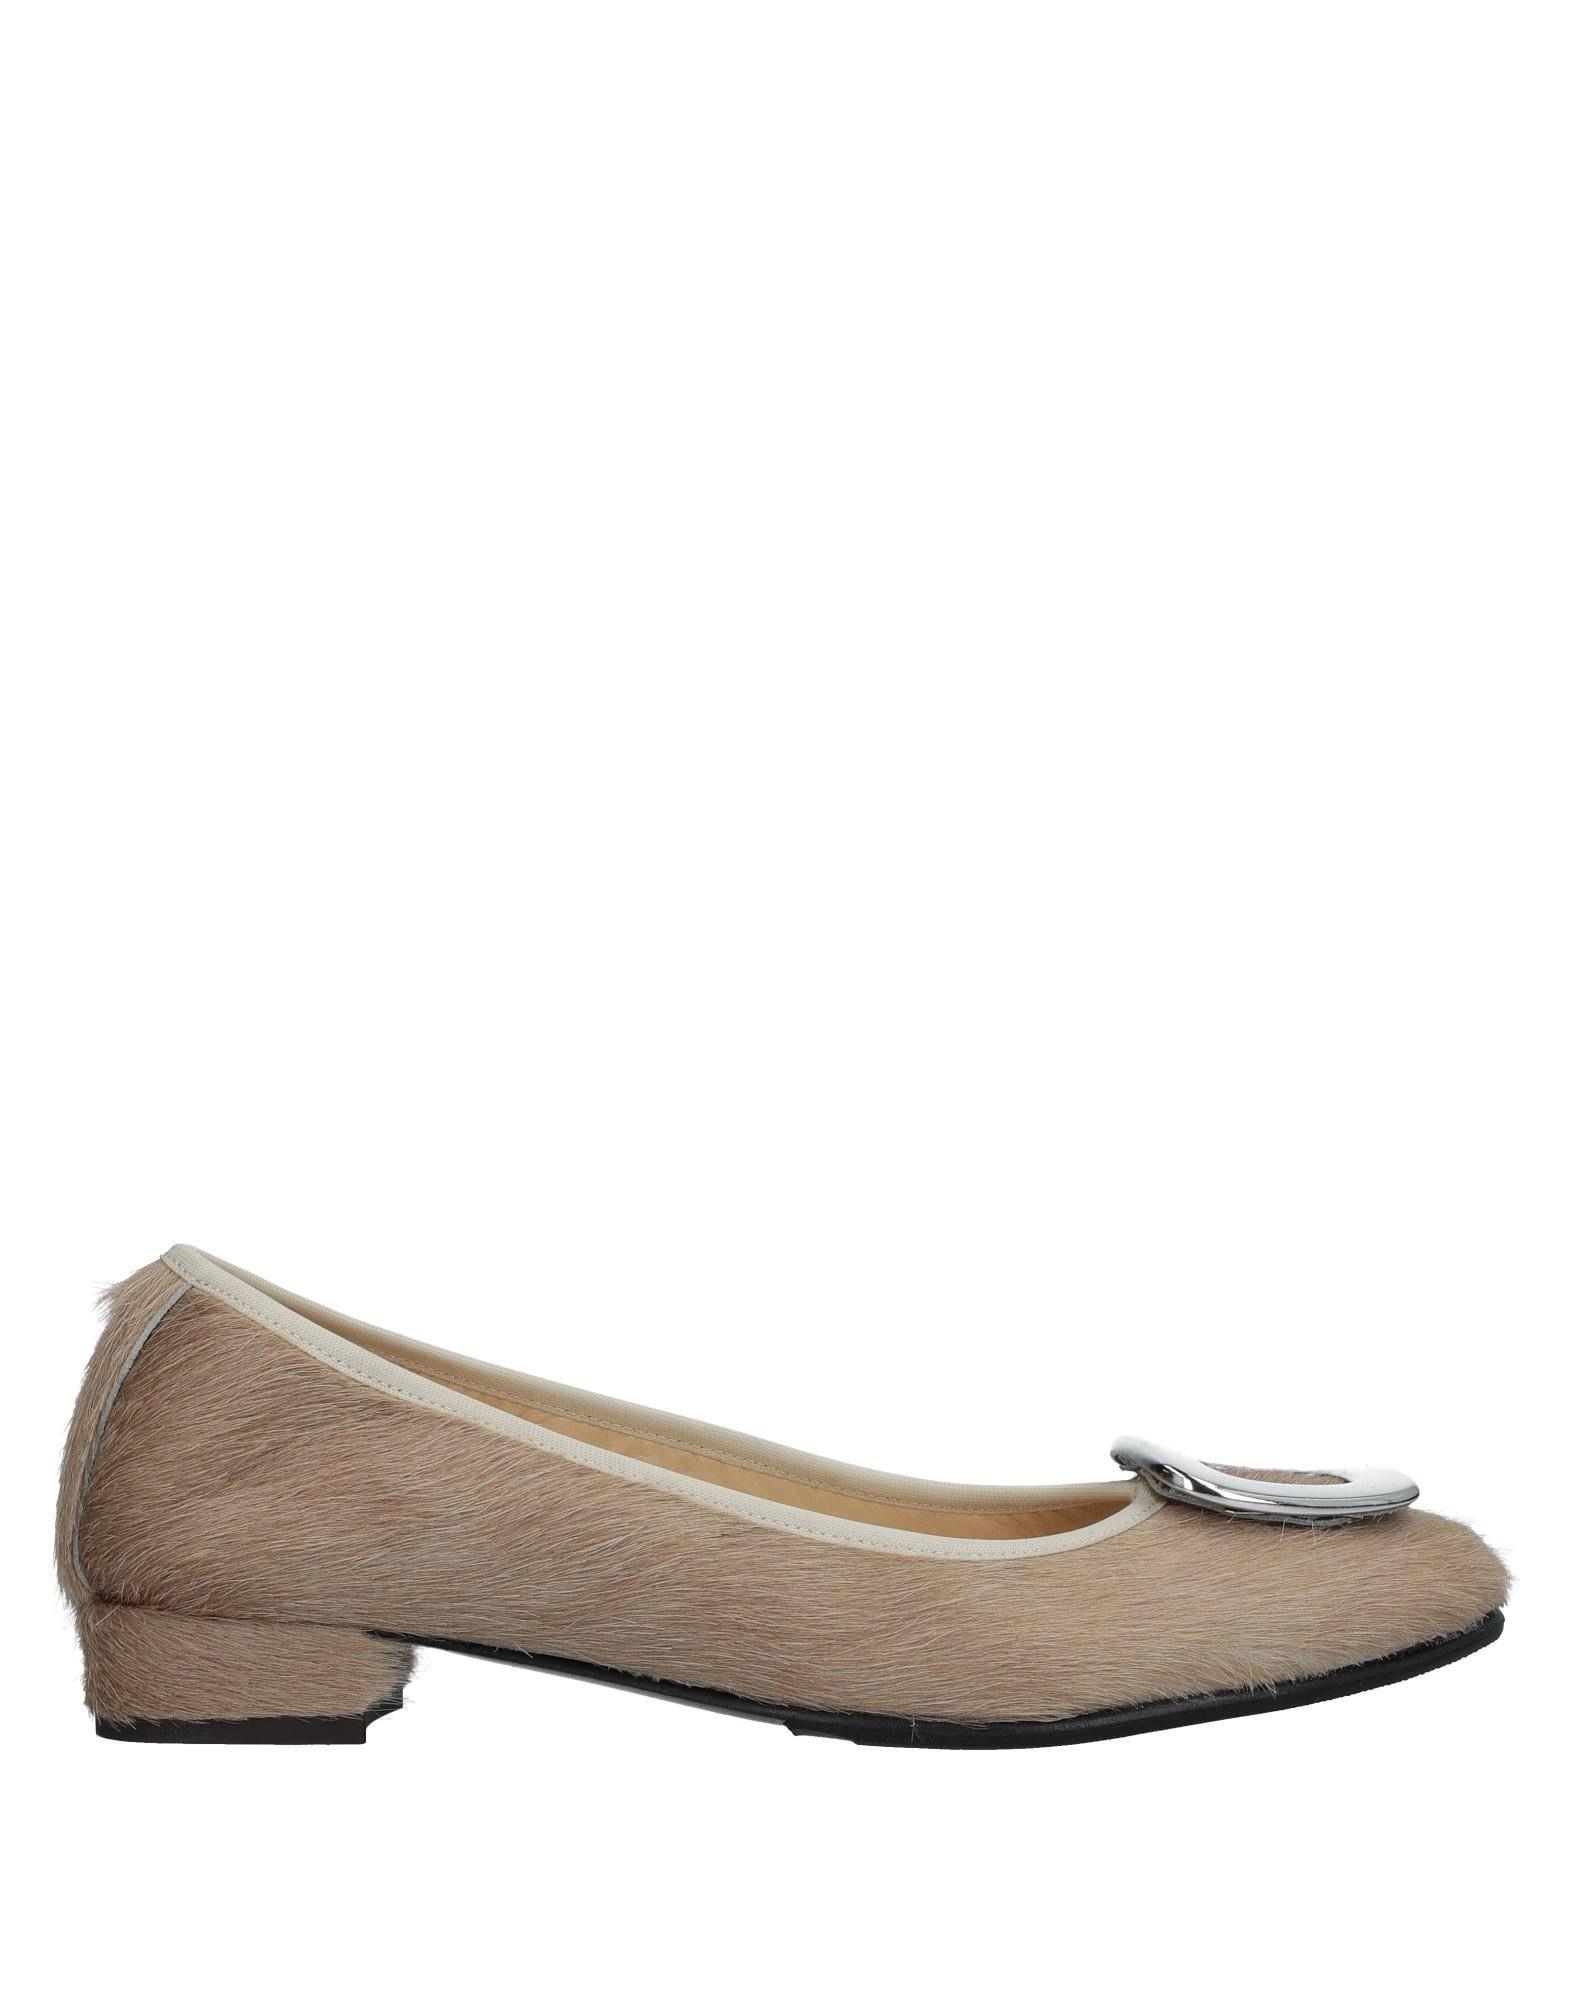 Andrea Morando Ballerinas Damen  11525261OE Gute Qualität beliebte Schuhe